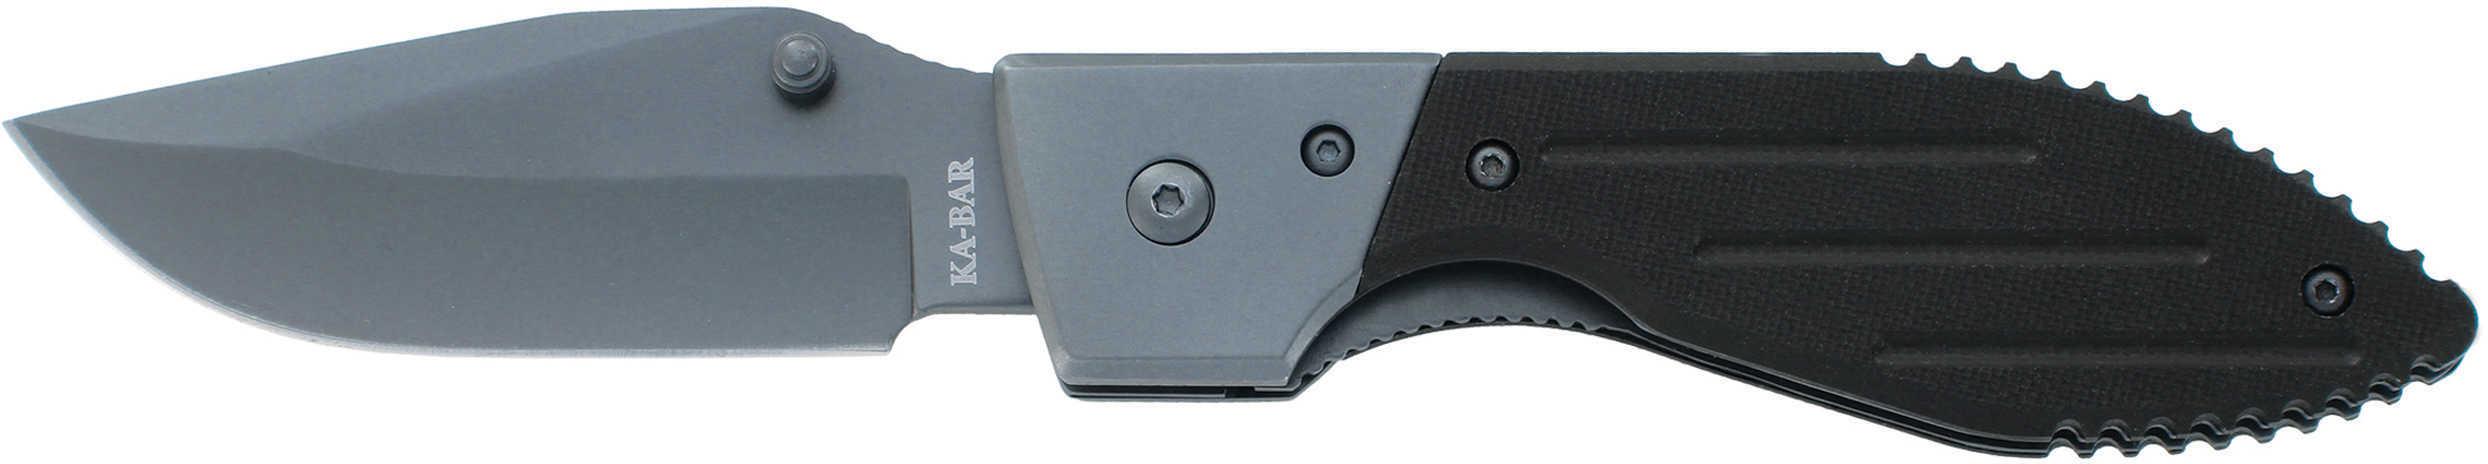 "Ka-Bar 3072 Warthog Folder 3"" 5Cr15 Stainless Steel Clip Point G10 Black"